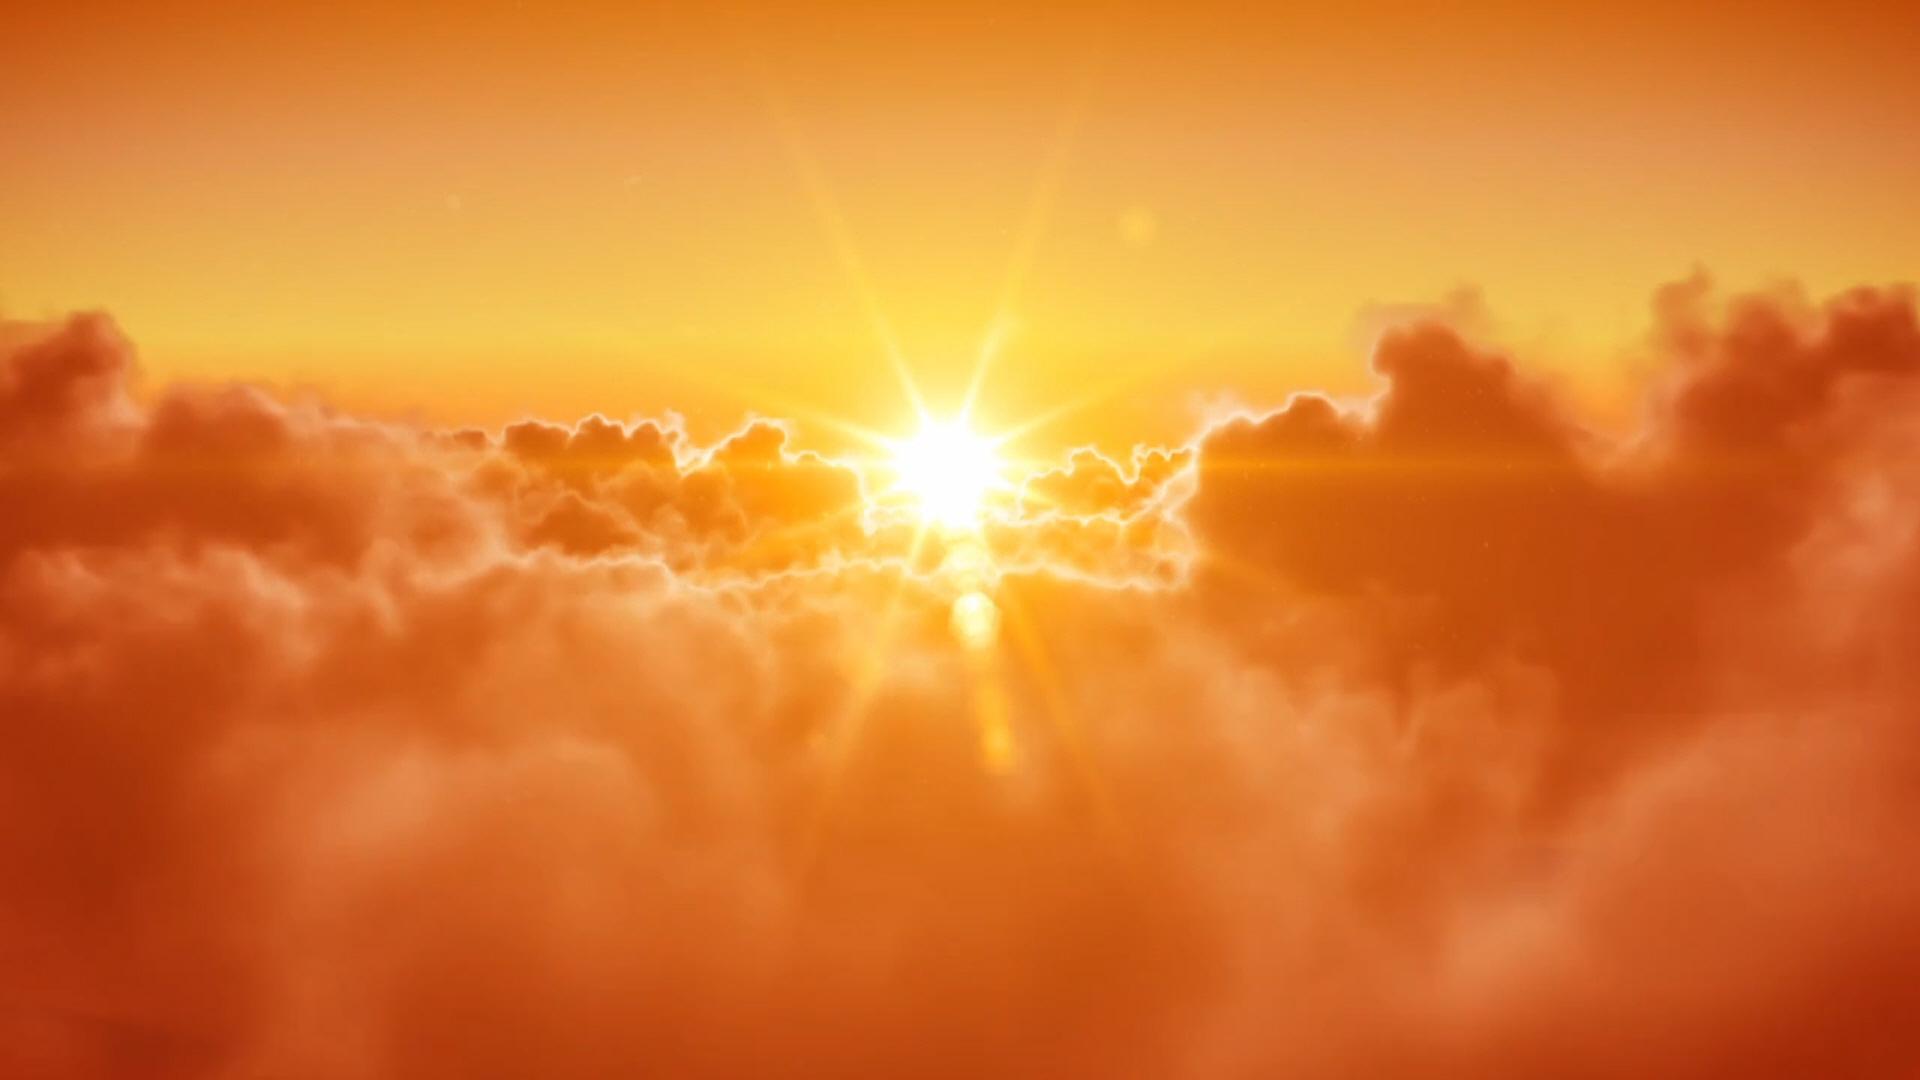 Download Beautiful Sun Ray Wallpaper 567x439 - Full HD Wall